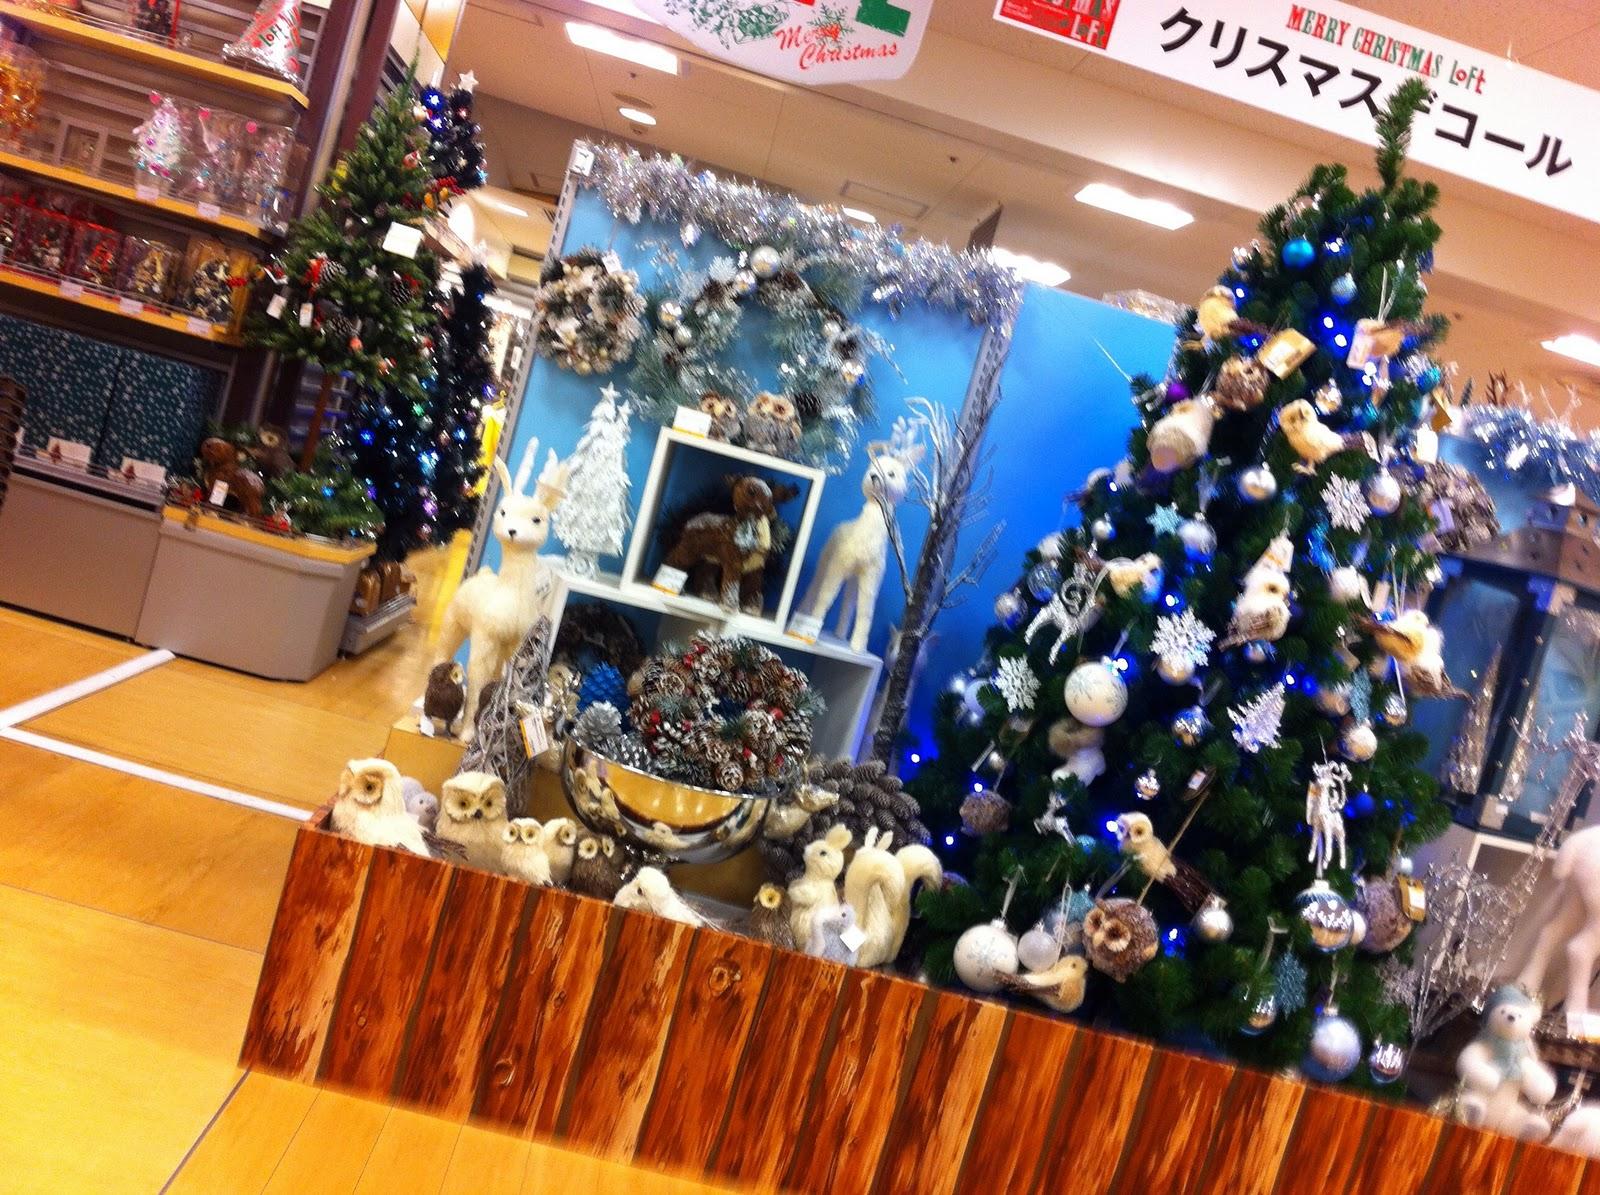 Merry Christmas in Japan